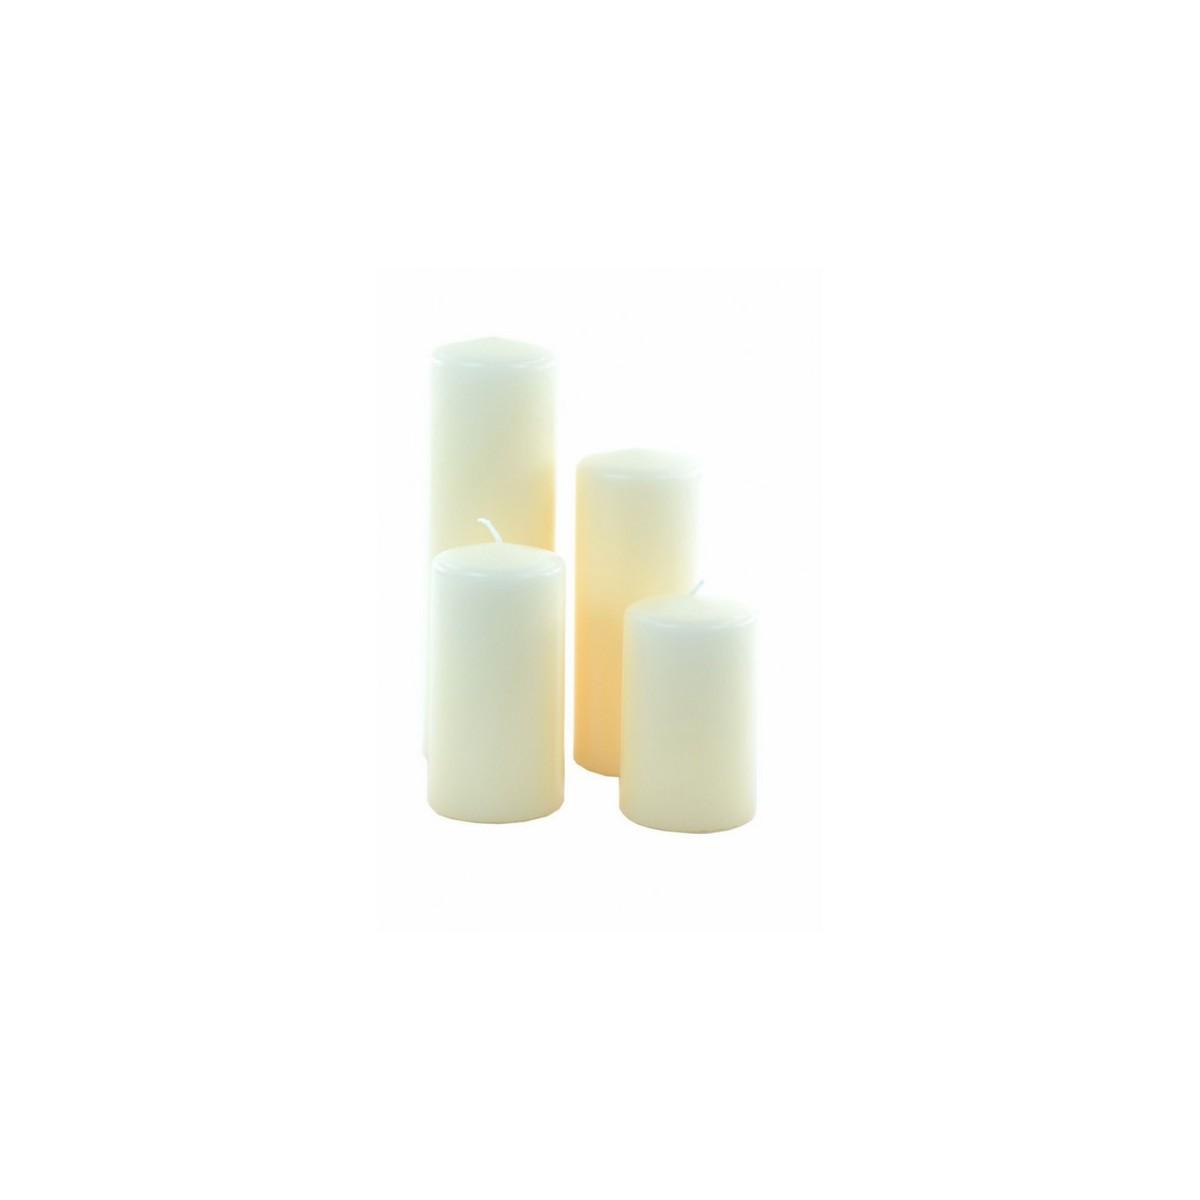 4 Moccoli Laccati da Cm 9-11-14-19 Dm6 Bianco